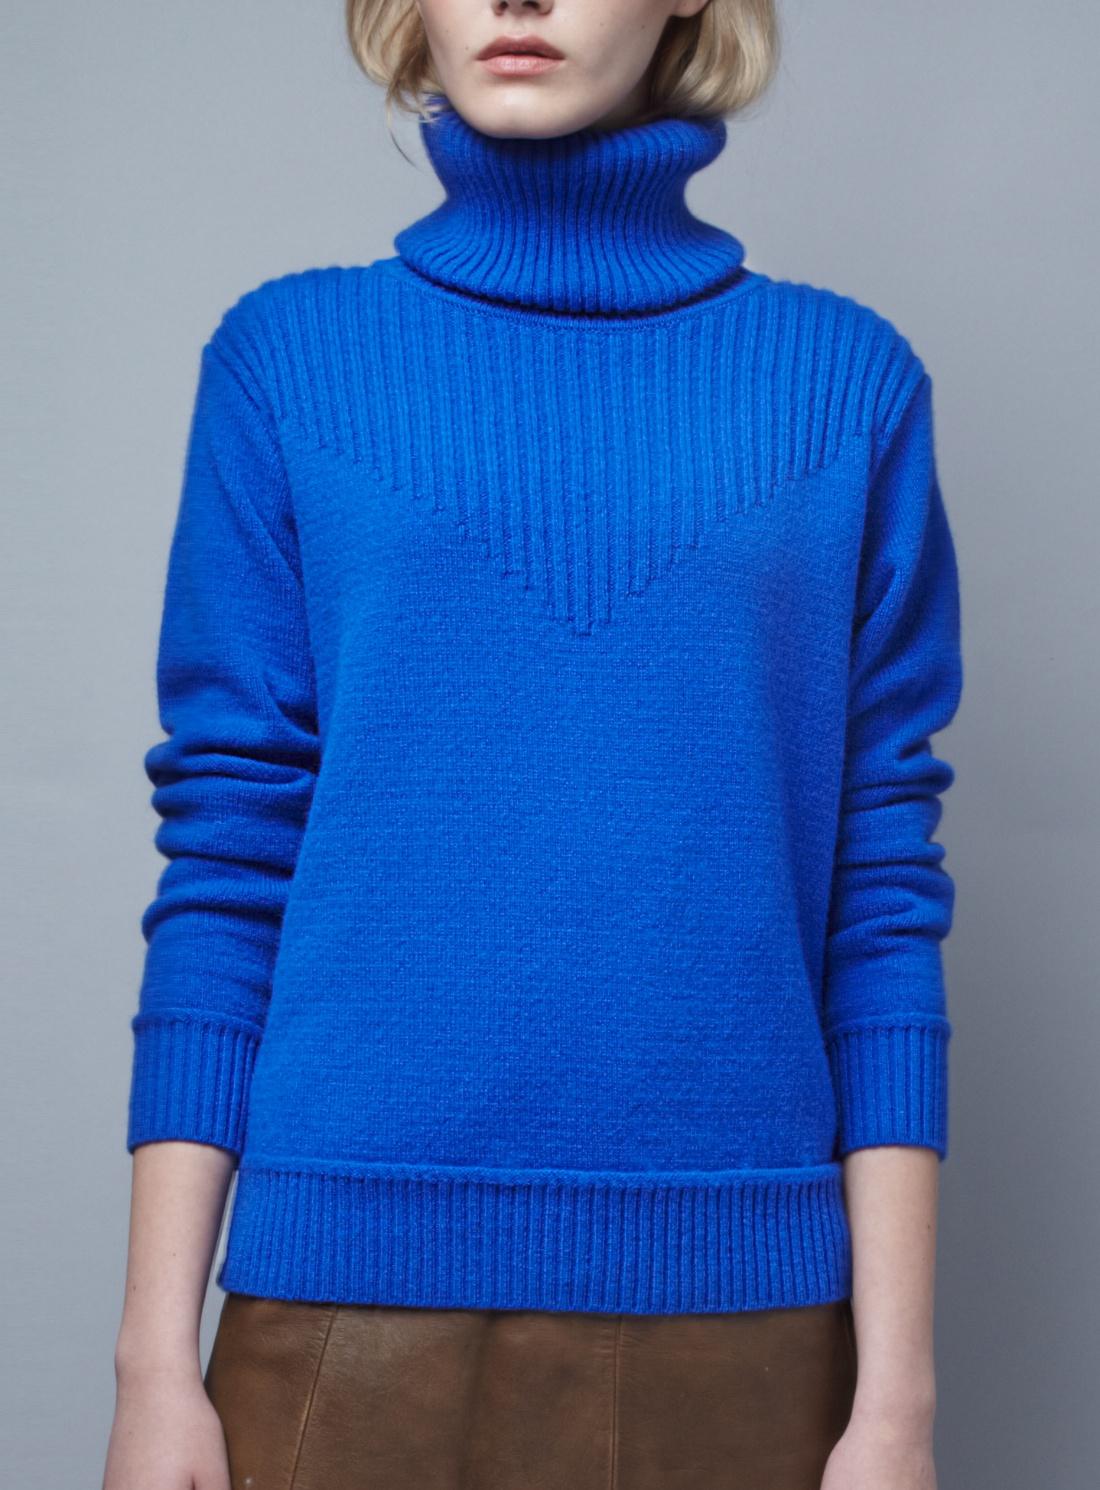 Blake ldn Cobalt Blue Redfern Turtleneck Sweater - Last One in ...